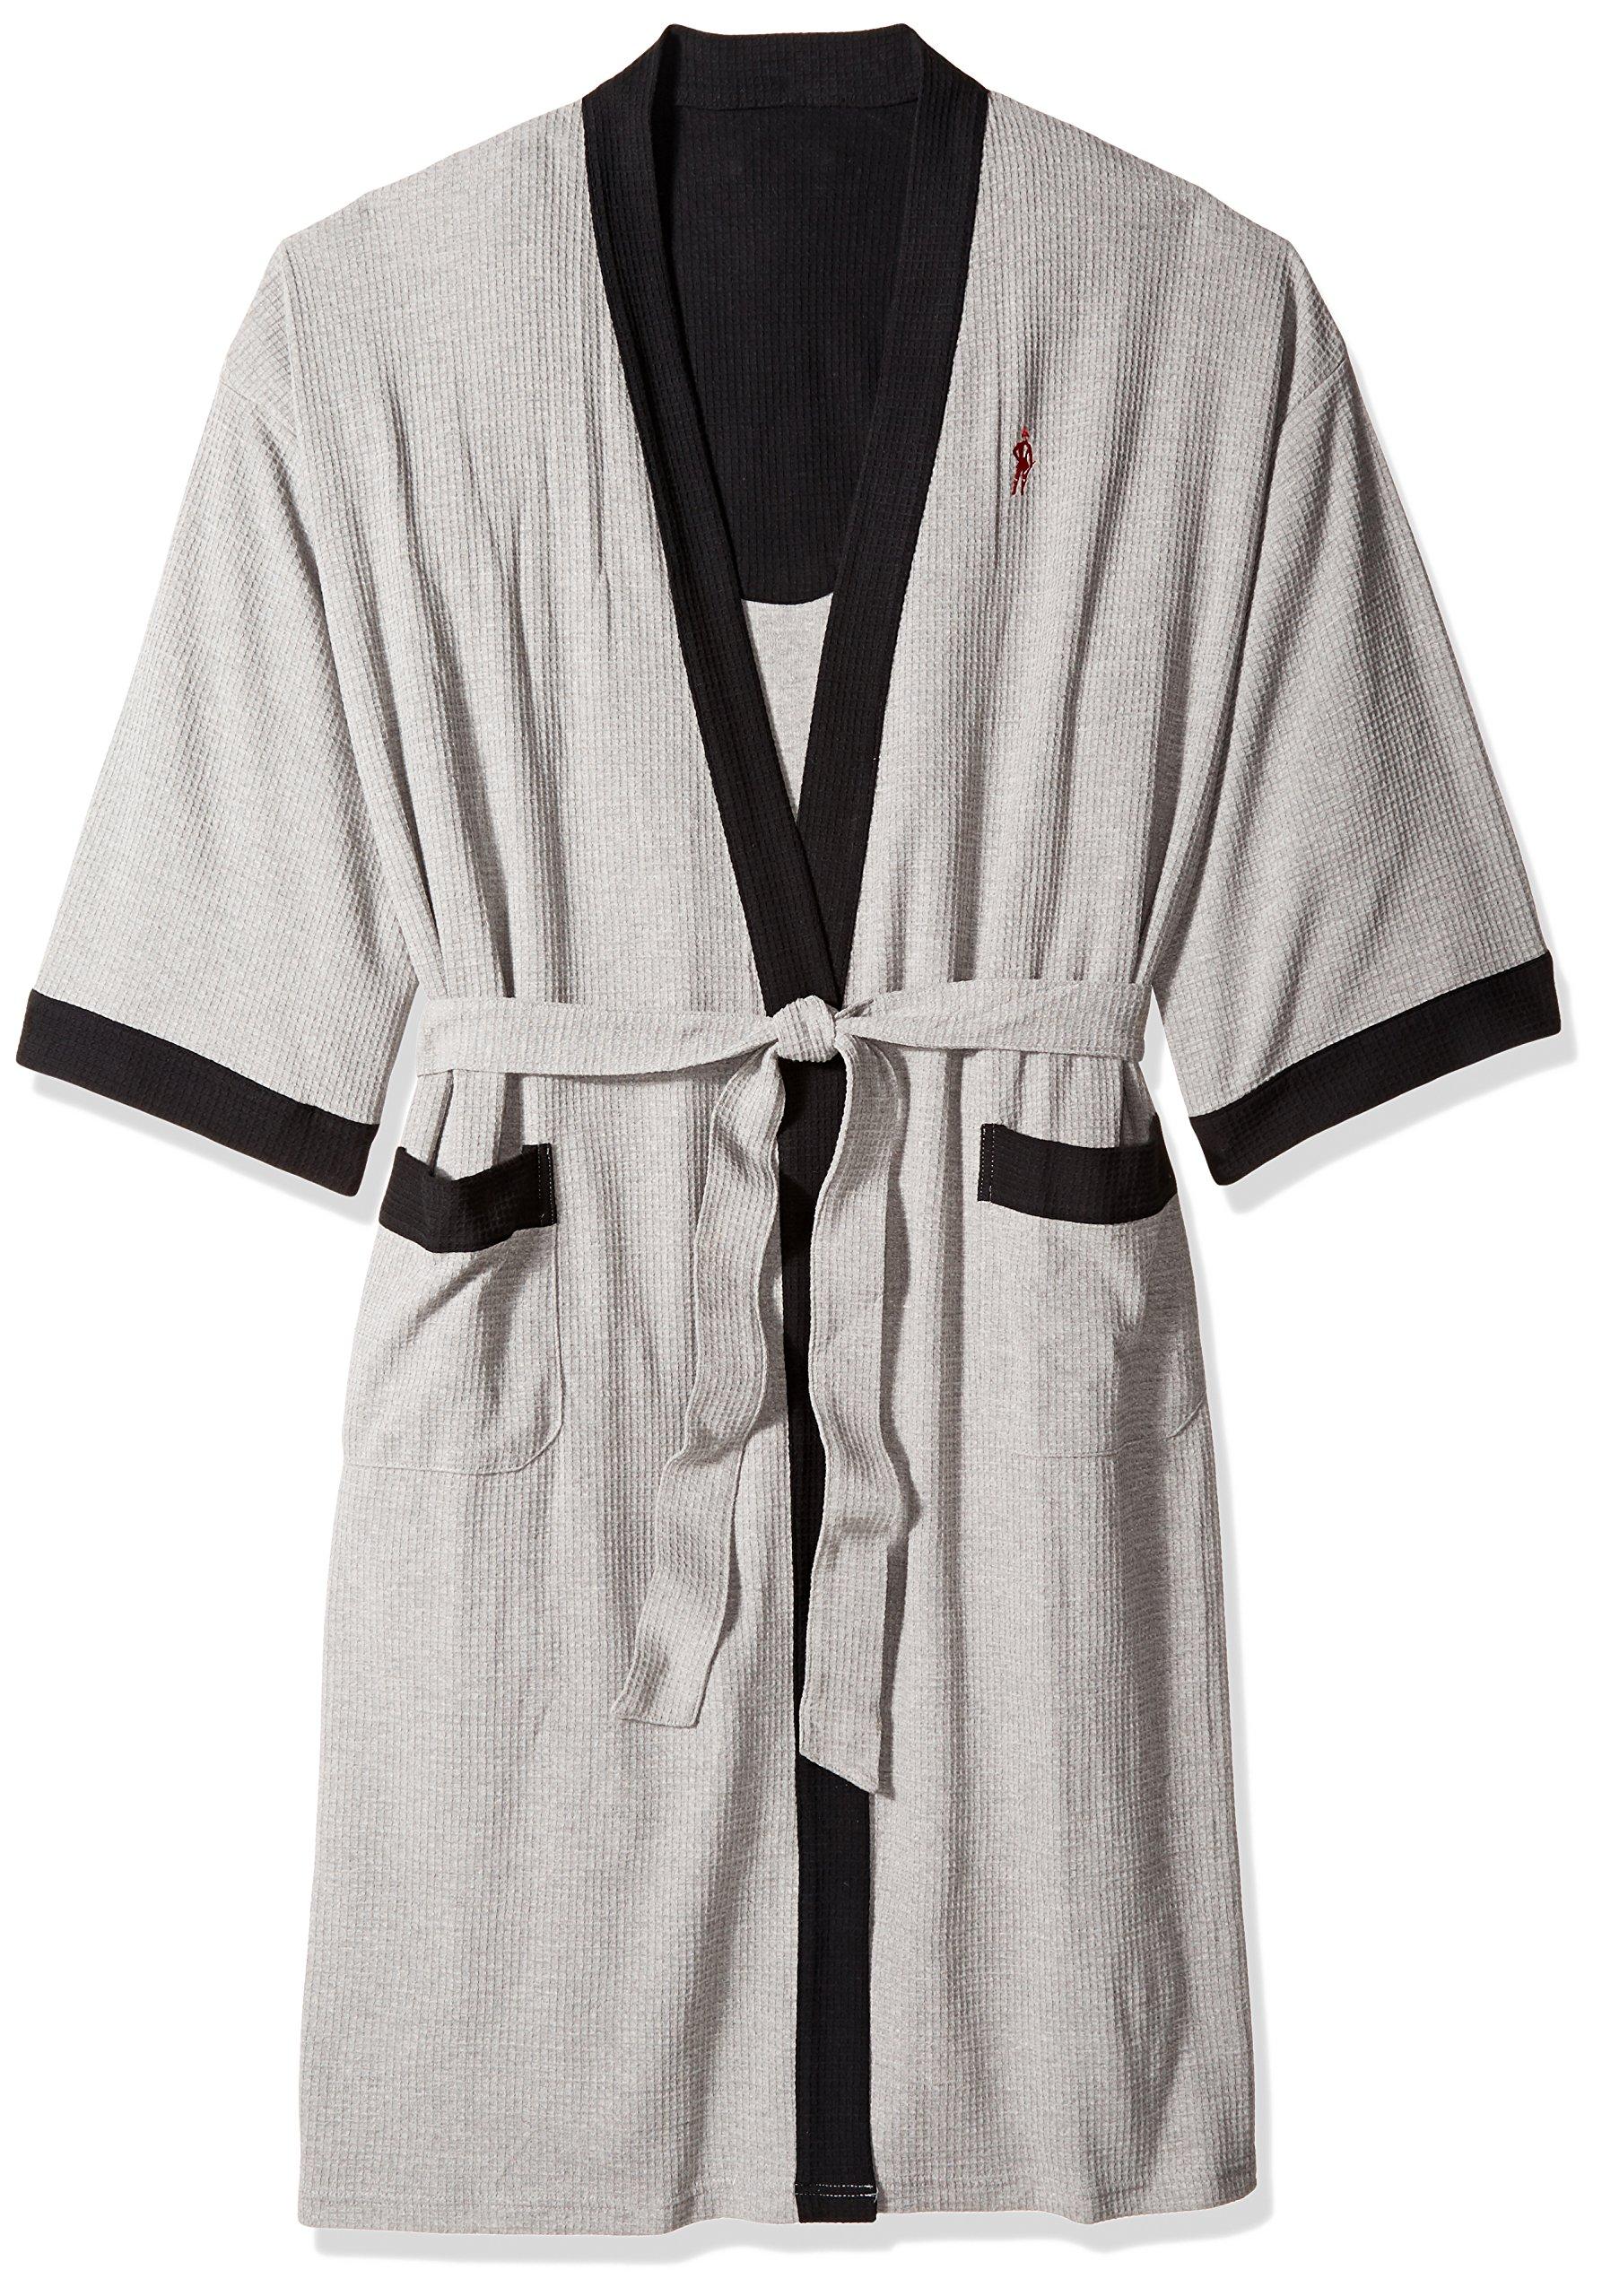 Jockey Men's Tall Size Waffle-Weave Kimono Robe, Grey Heather/Blue, 2/3XT